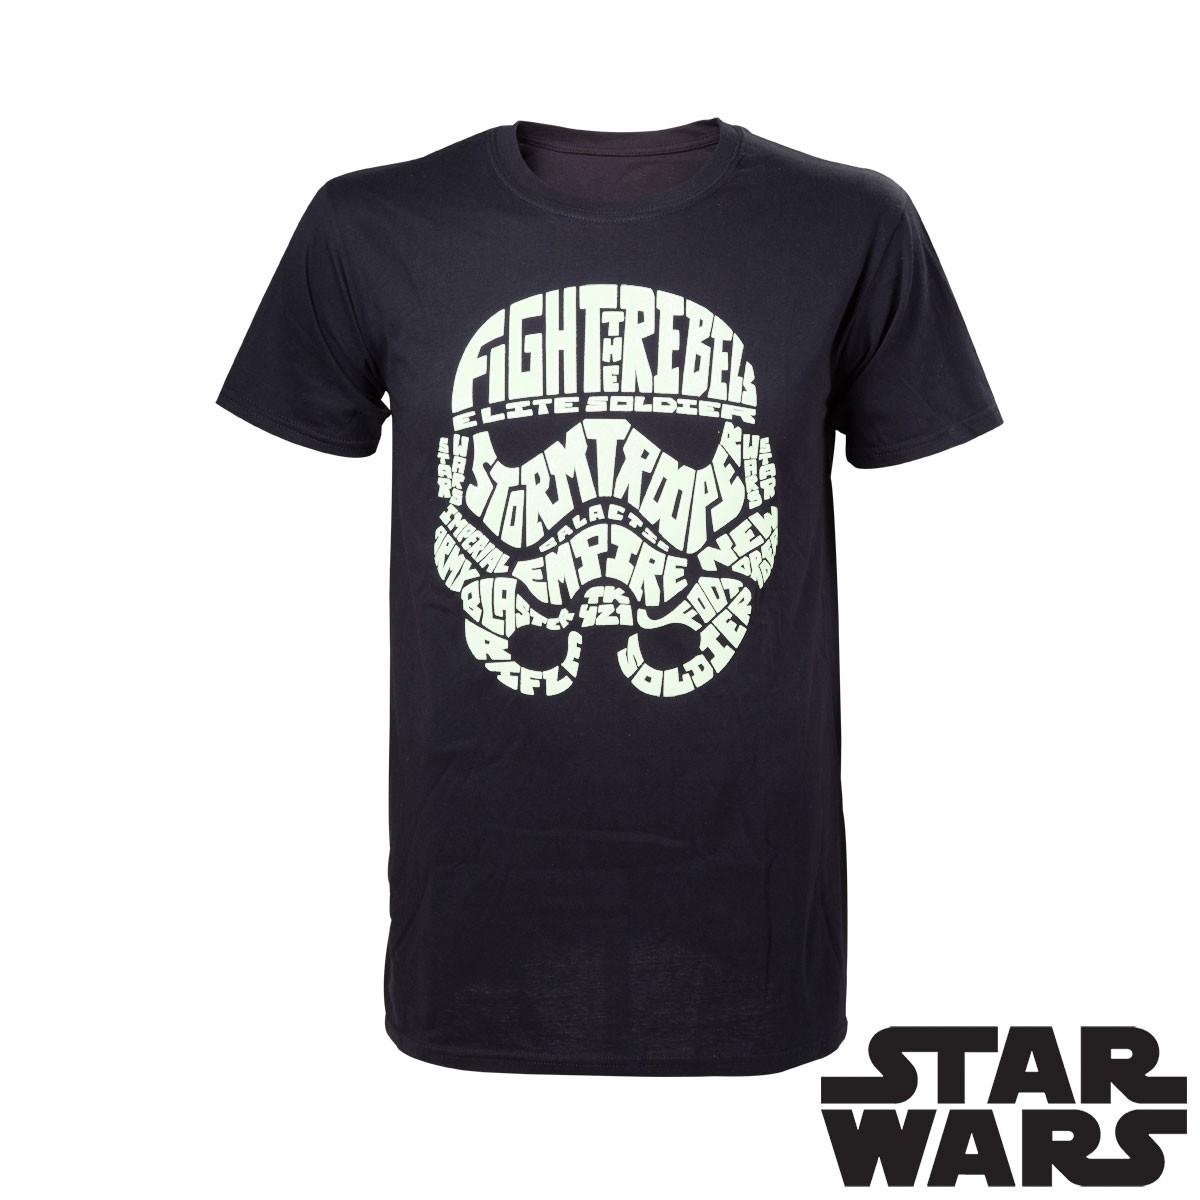 t shirt star wars avec casque de stormtrooper phosphorescent sur rapid cadeau. Black Bedroom Furniture Sets. Home Design Ideas